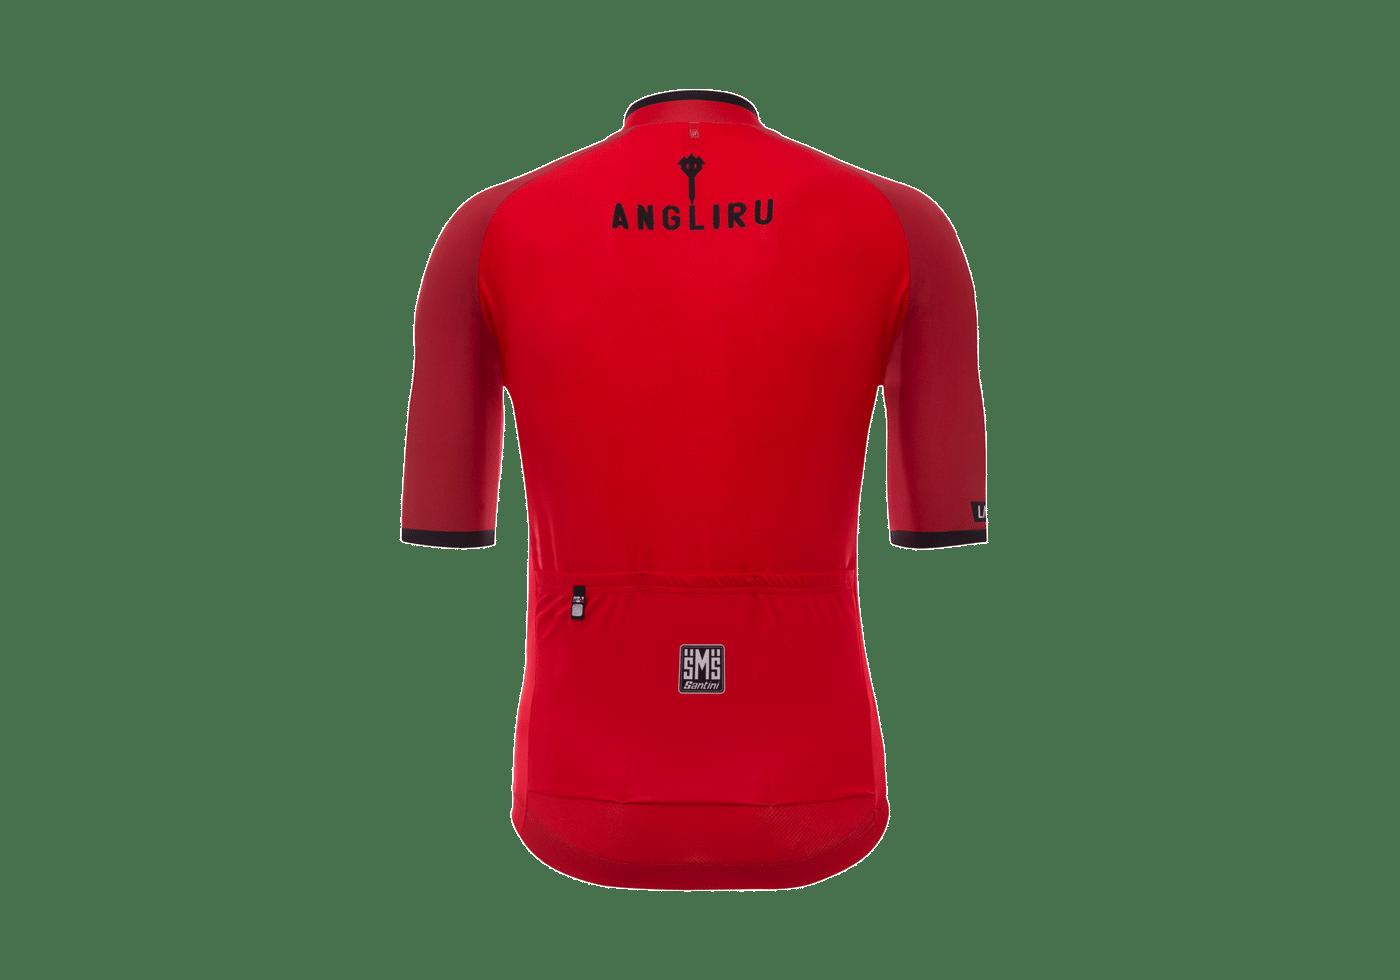 Maillot La Vuelta - Etapa Angliru 2017 II